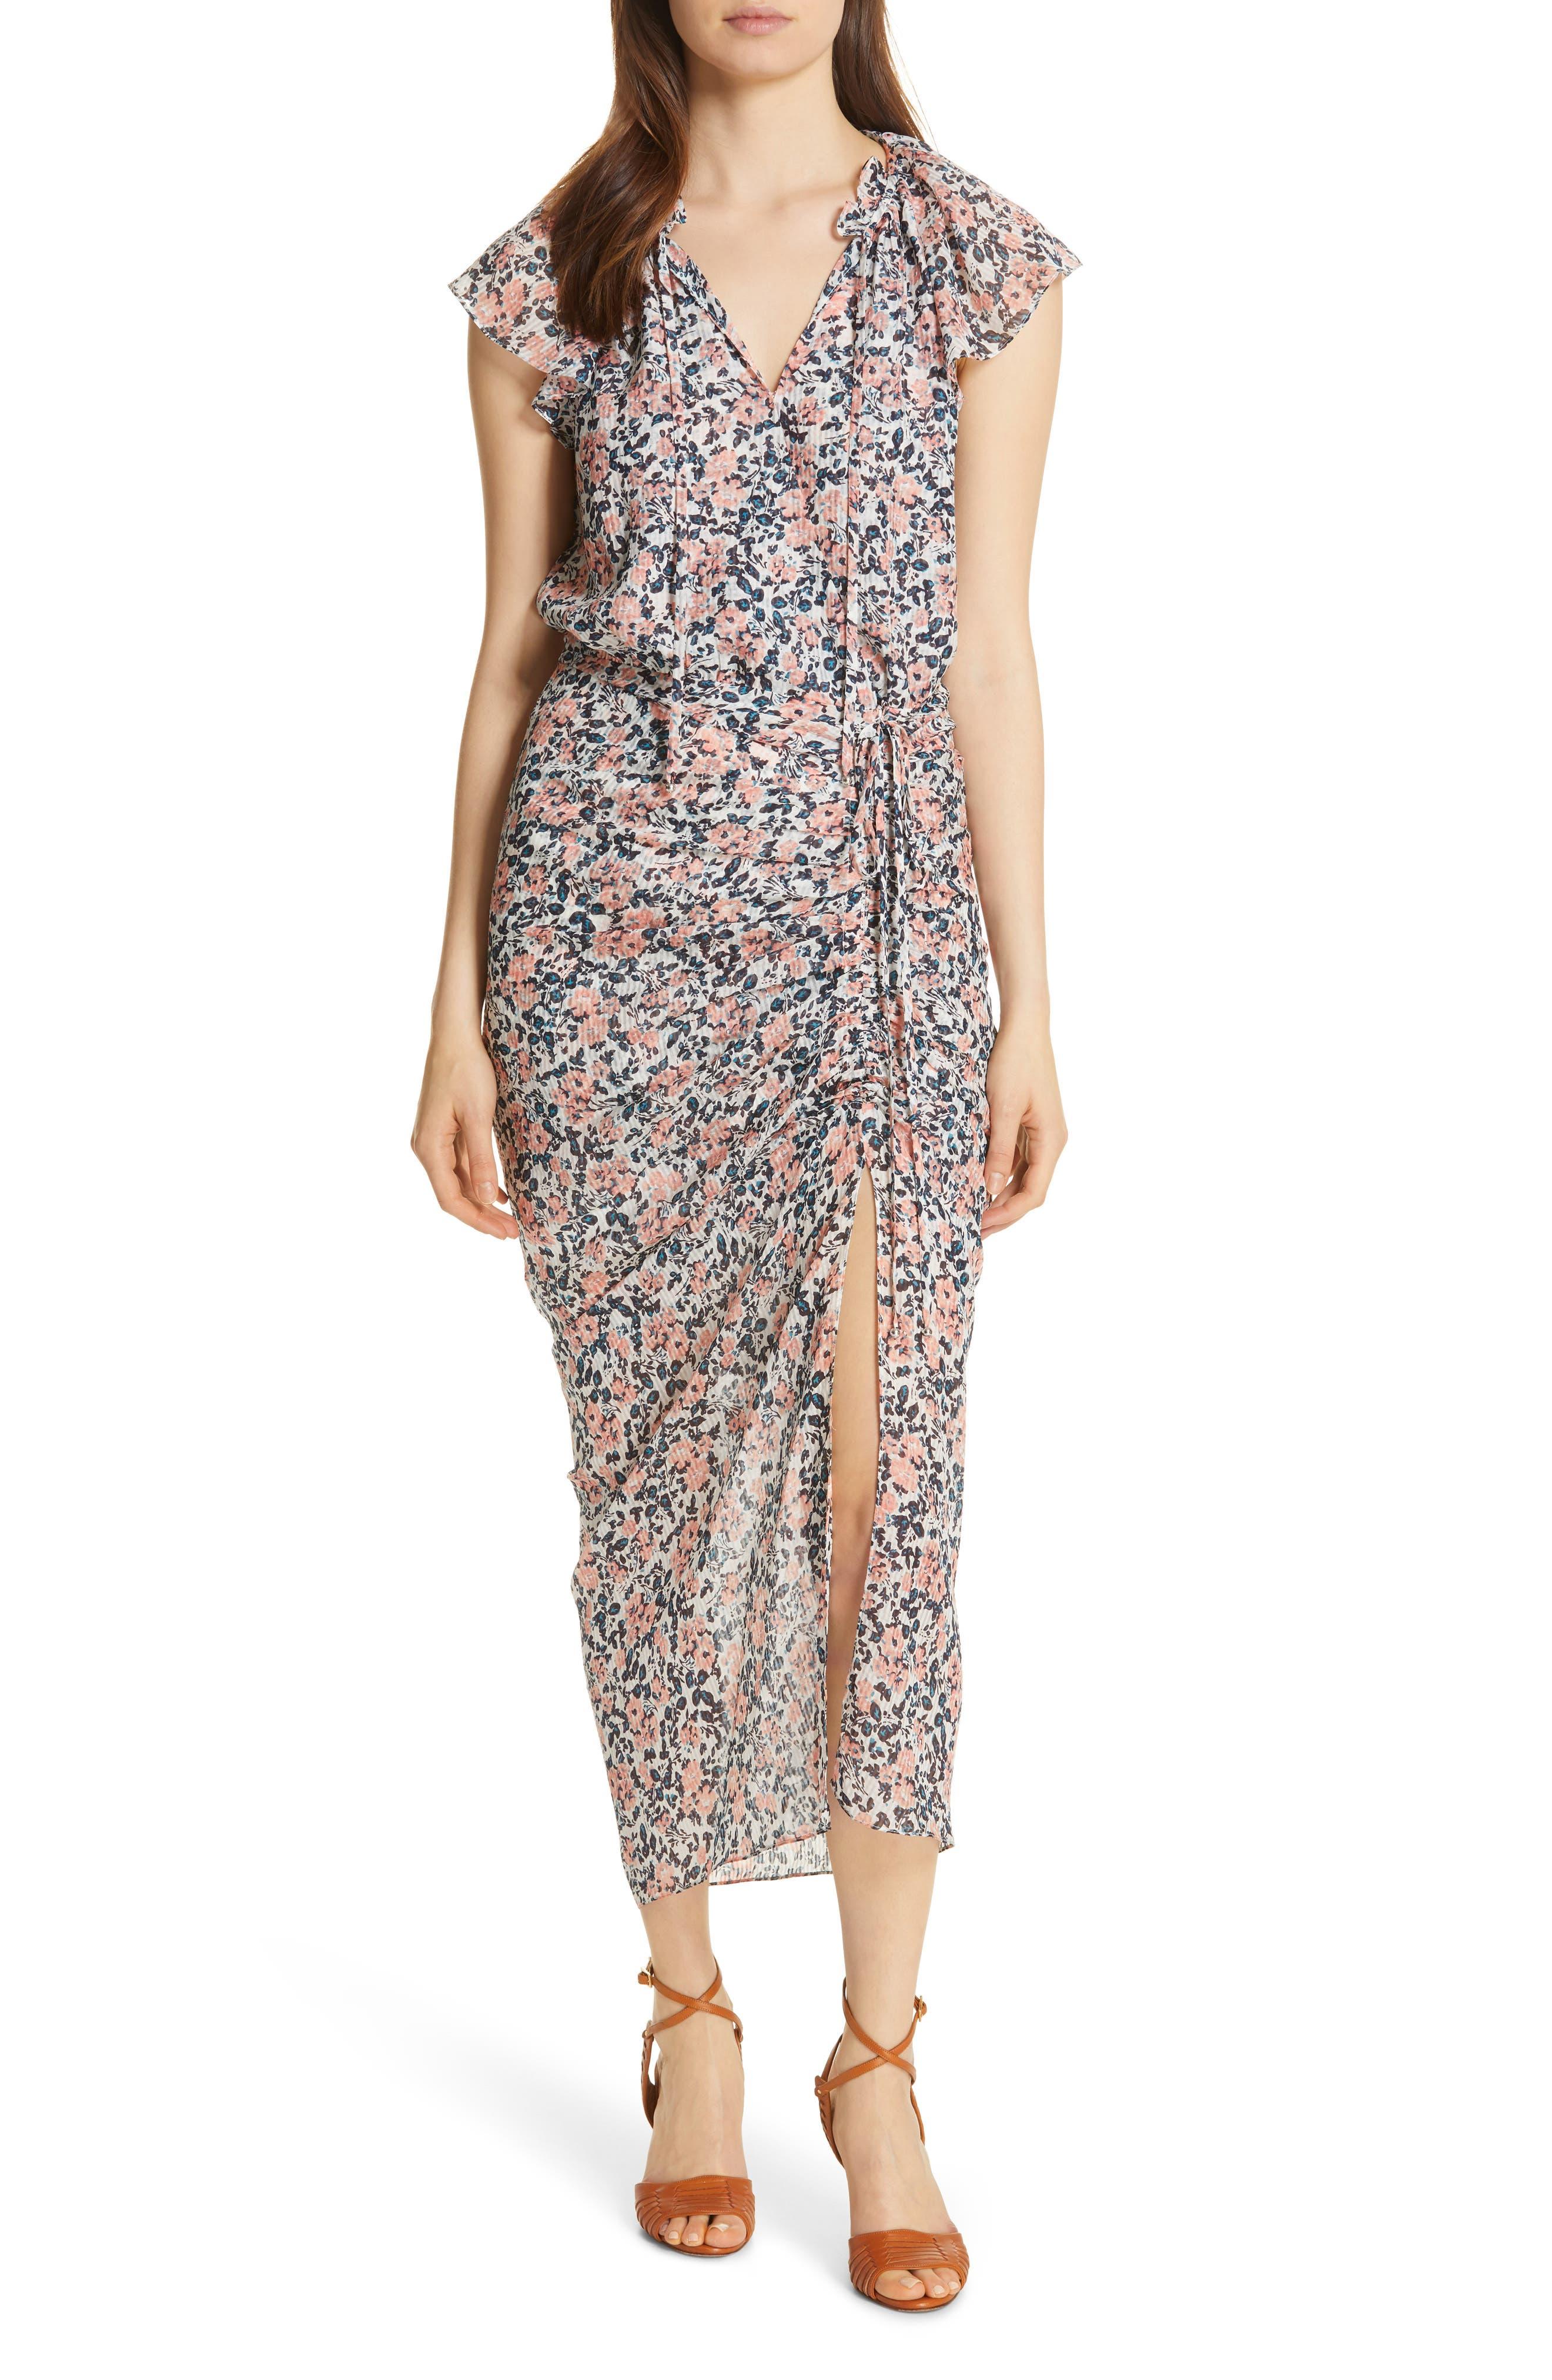 Veronica Beard Brynlee Ruched Silk Dress